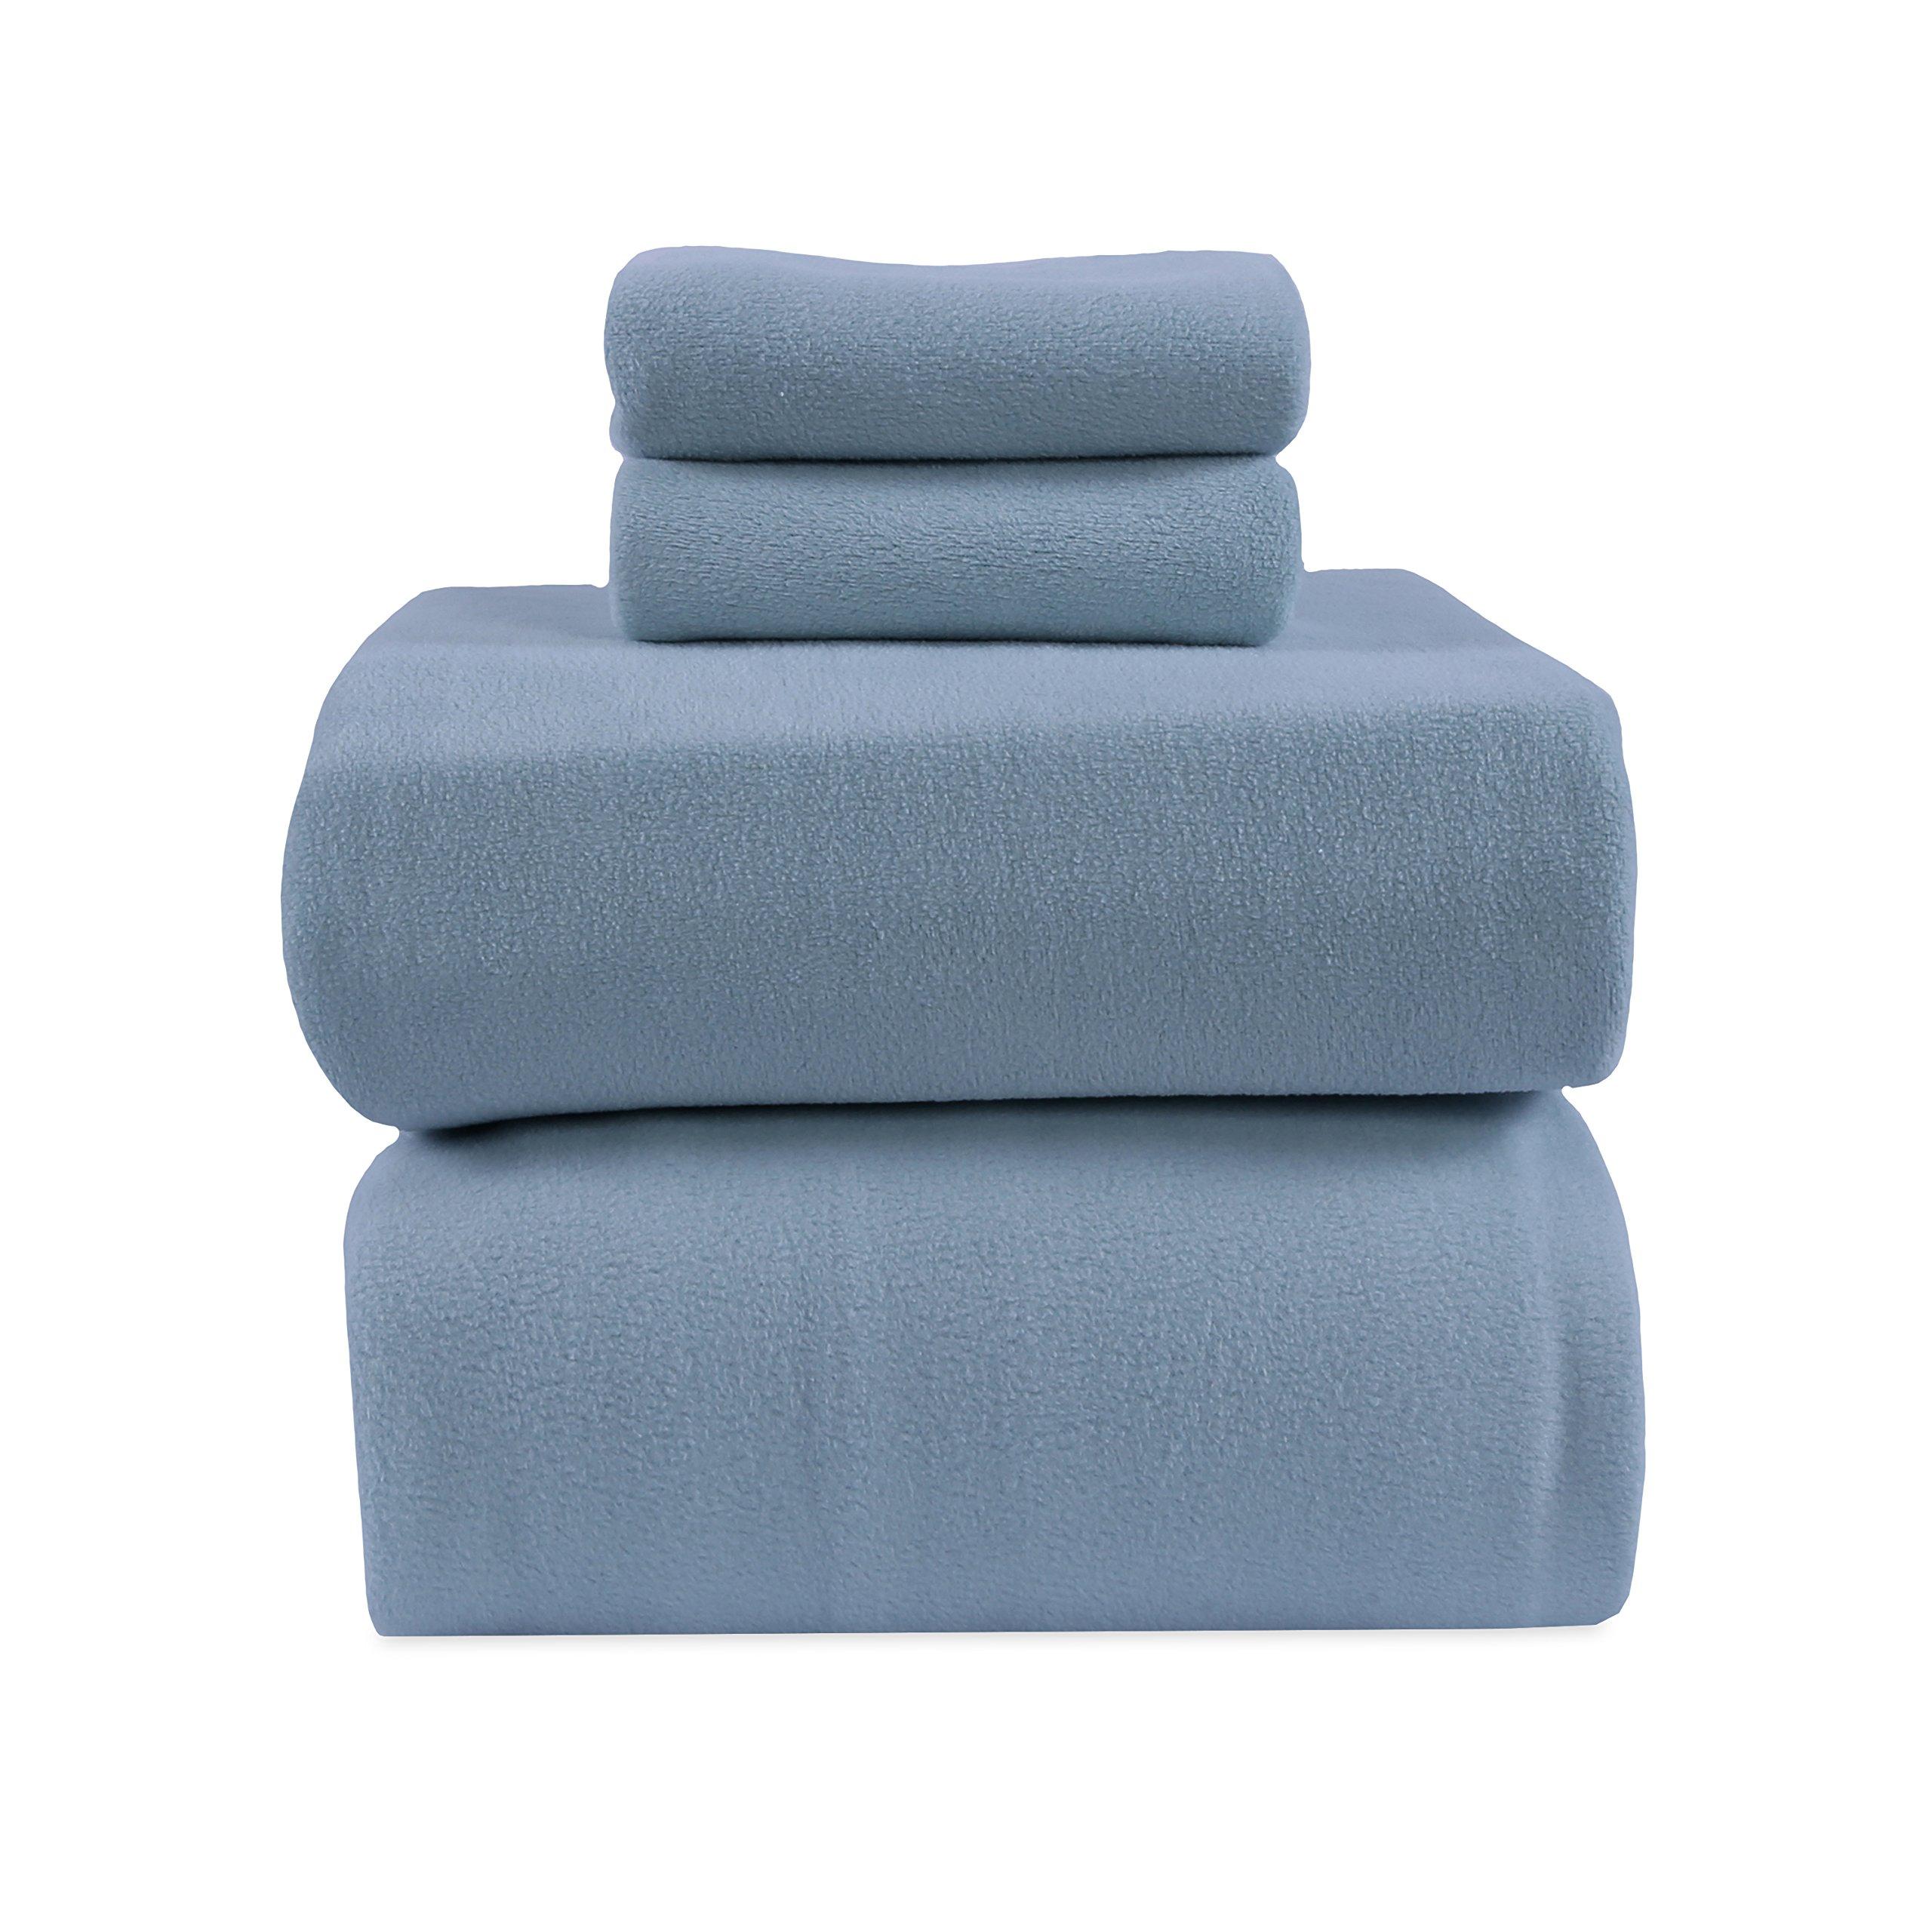 Berkshire Blanket Original Microfleece Sheet Set Fleece, Full, Spa Blue